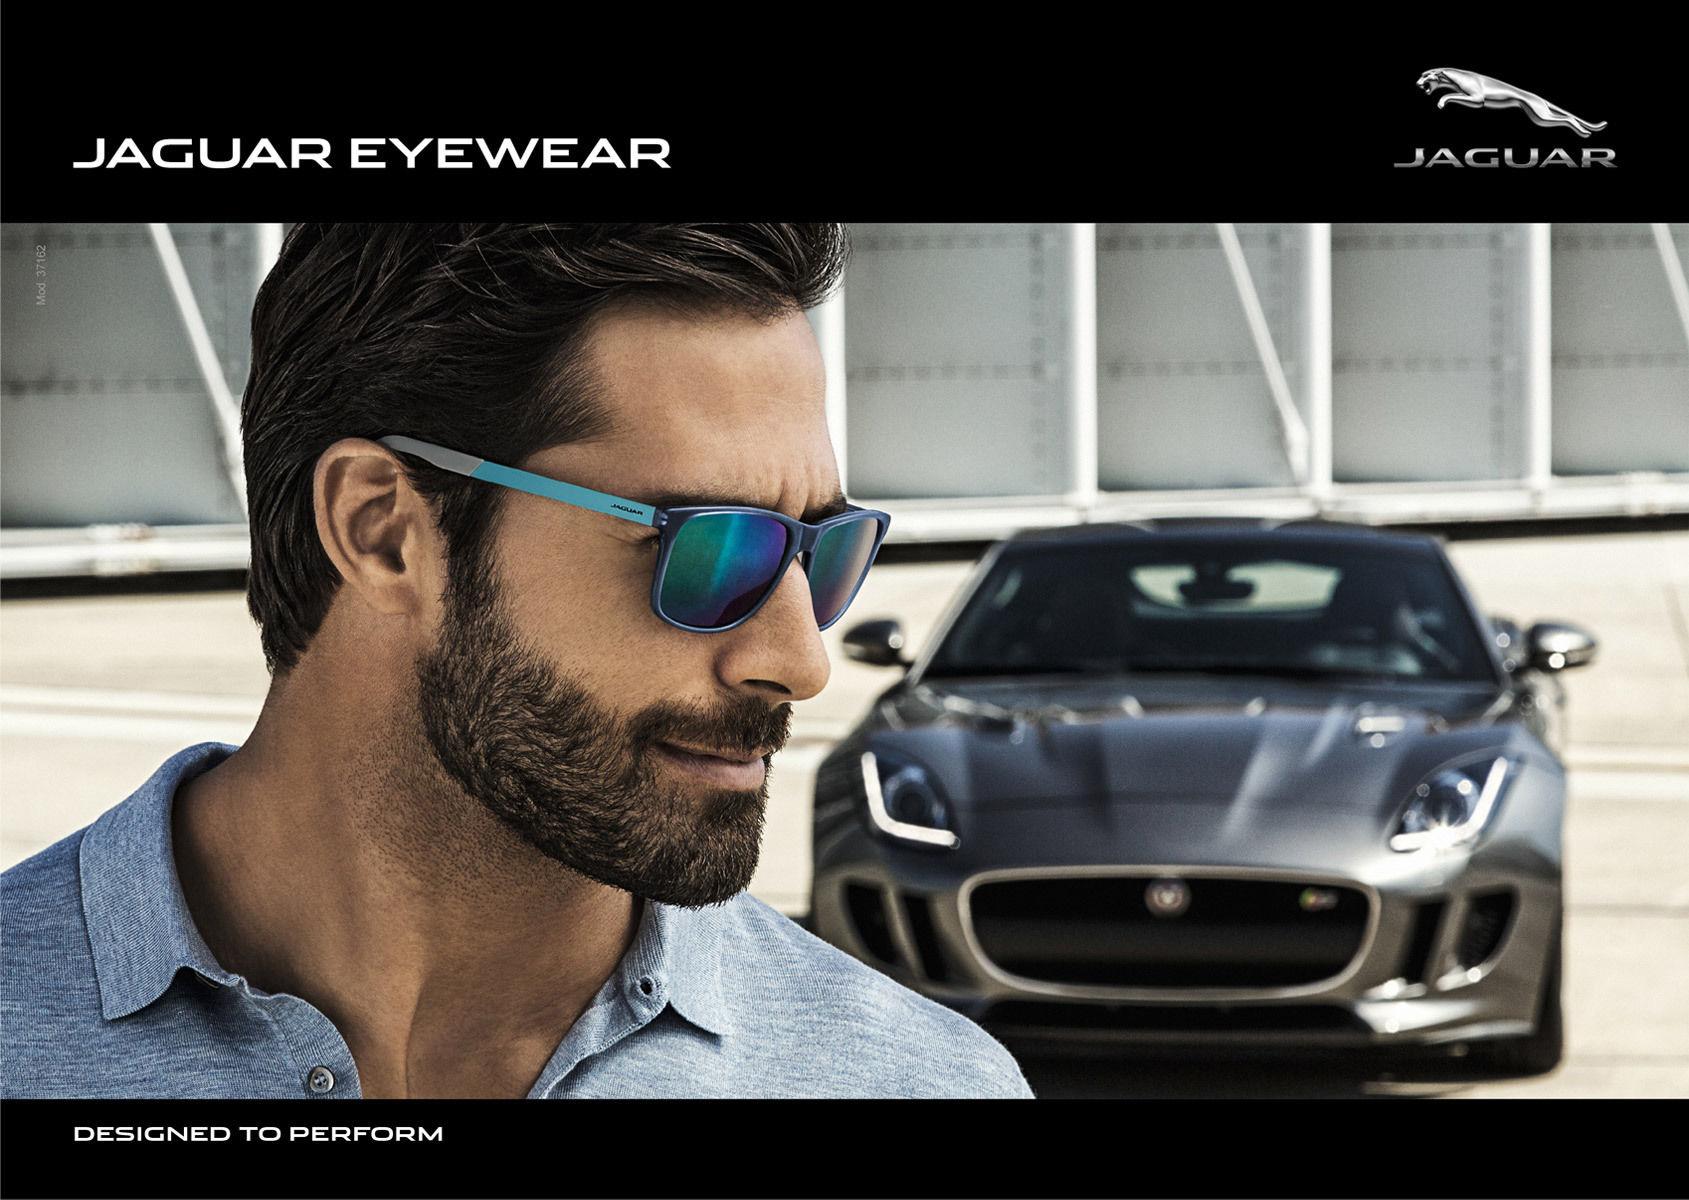 HILLE PHOTOGRAPHERS: Anja Boxhammer for Jaguar Eyewear Campaign Spring/Summer 2017